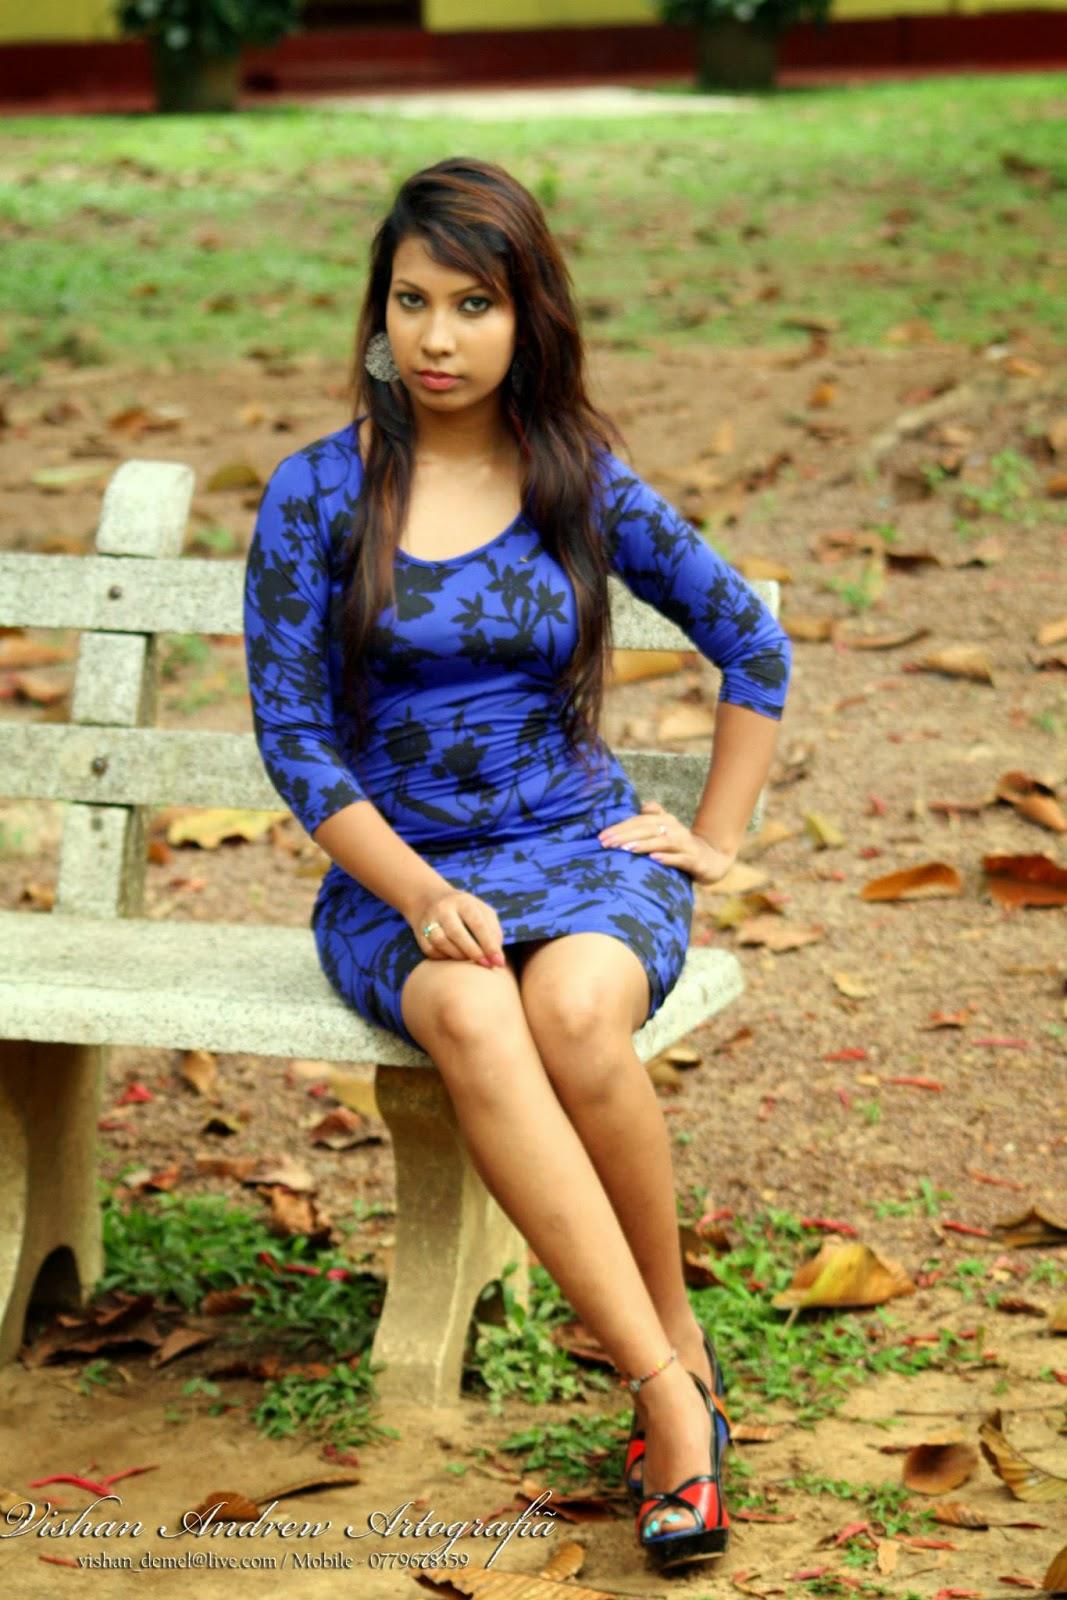 Jayani Alahapperuma hot thighs